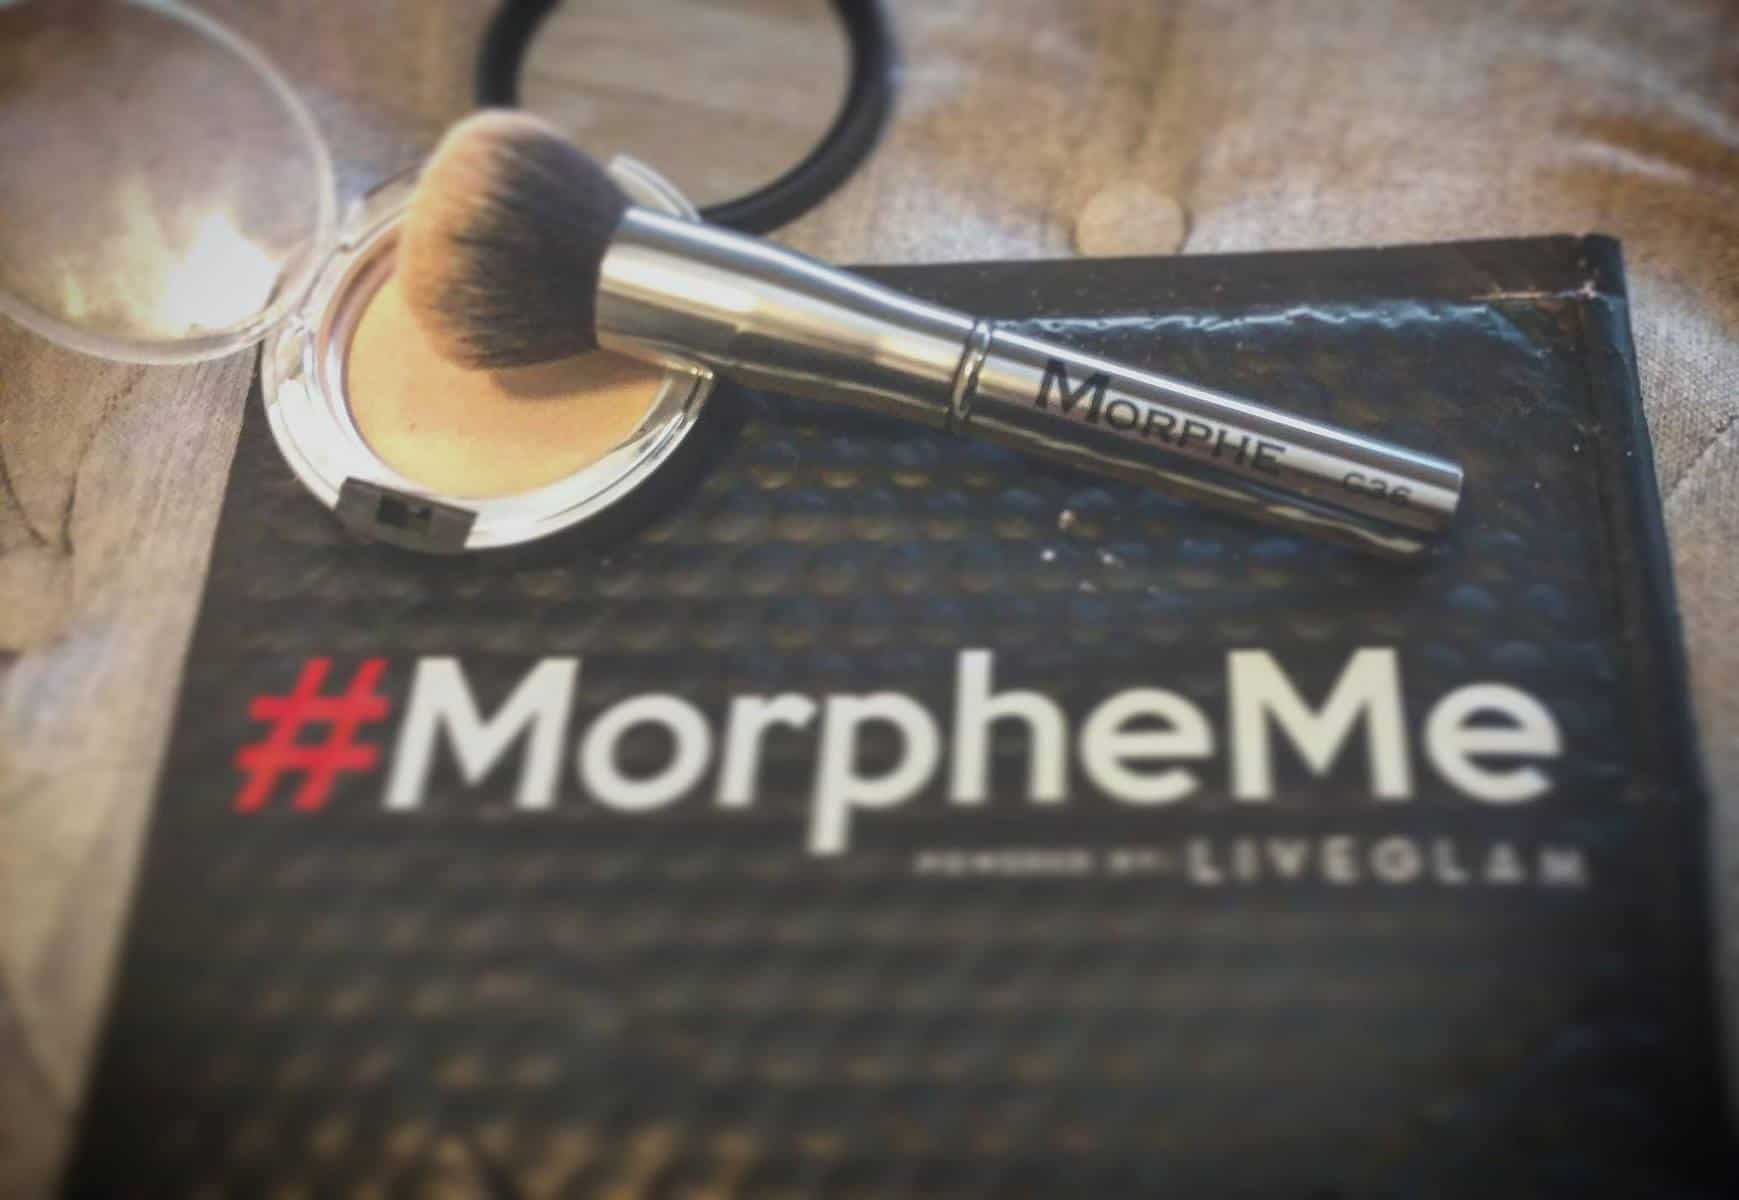 February 2017 LiveGlam MorpheMe Brush Club Review - Brush